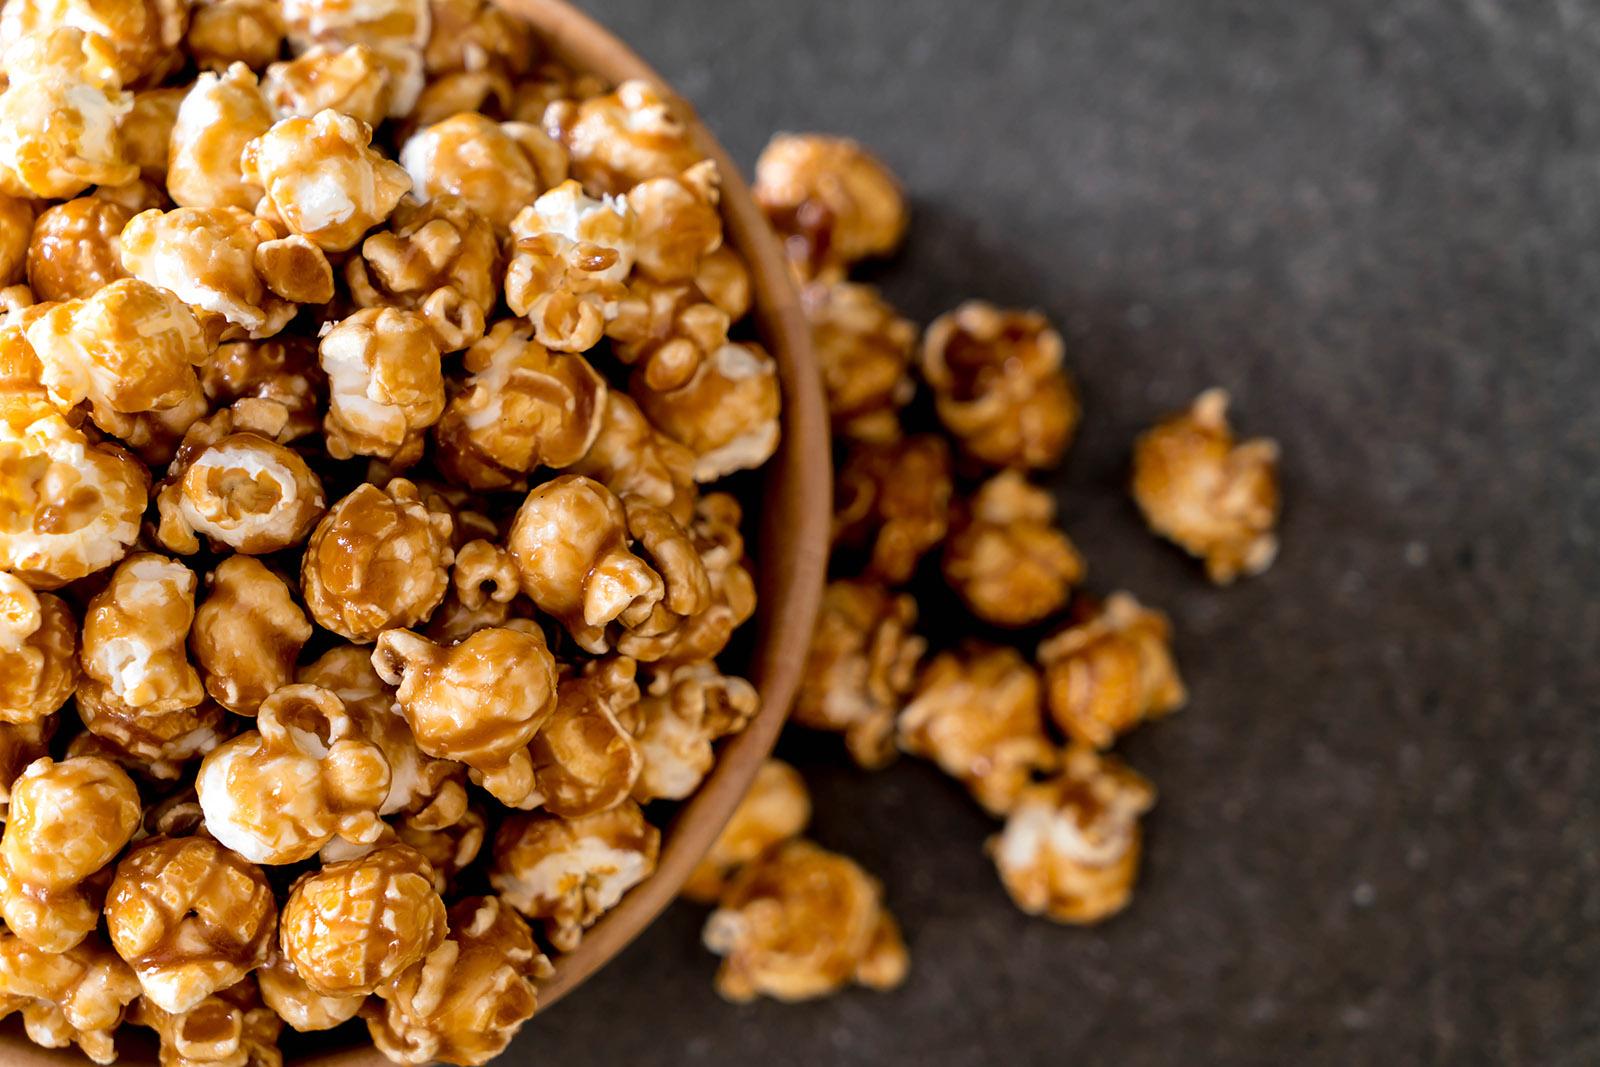 caramel popcorn in a wooden bowl